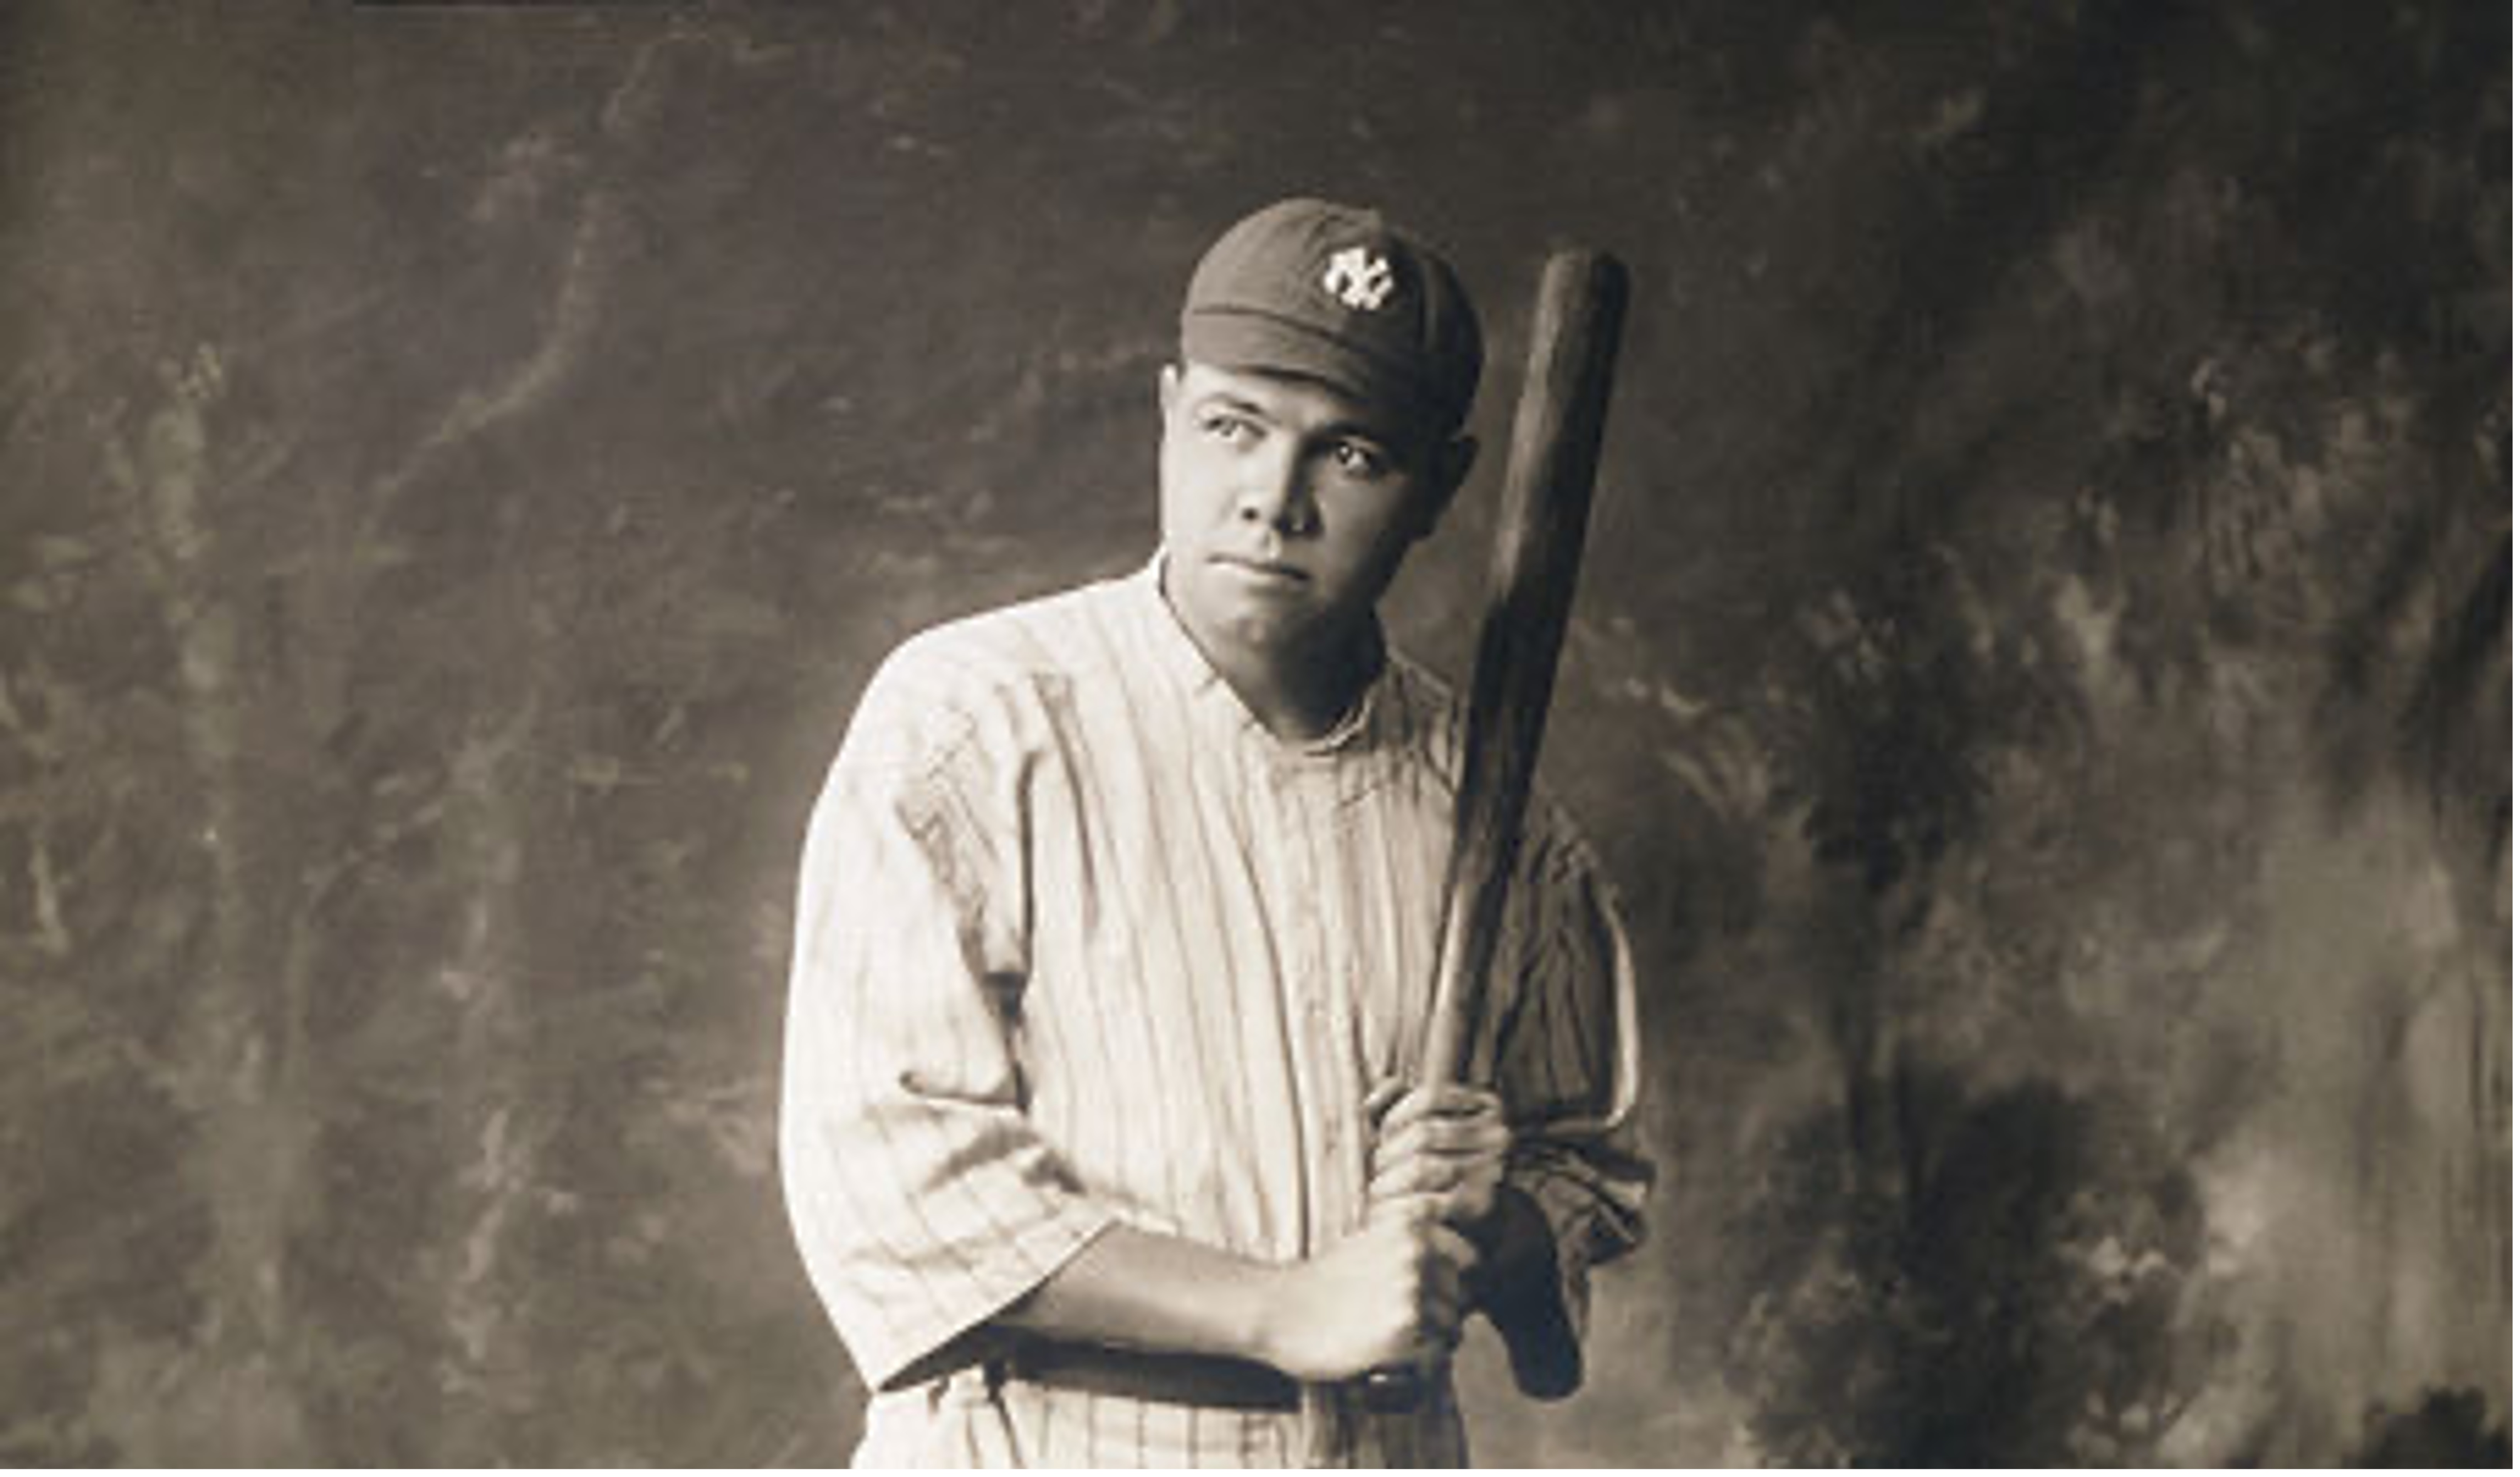 Babe Ruth holding a bat